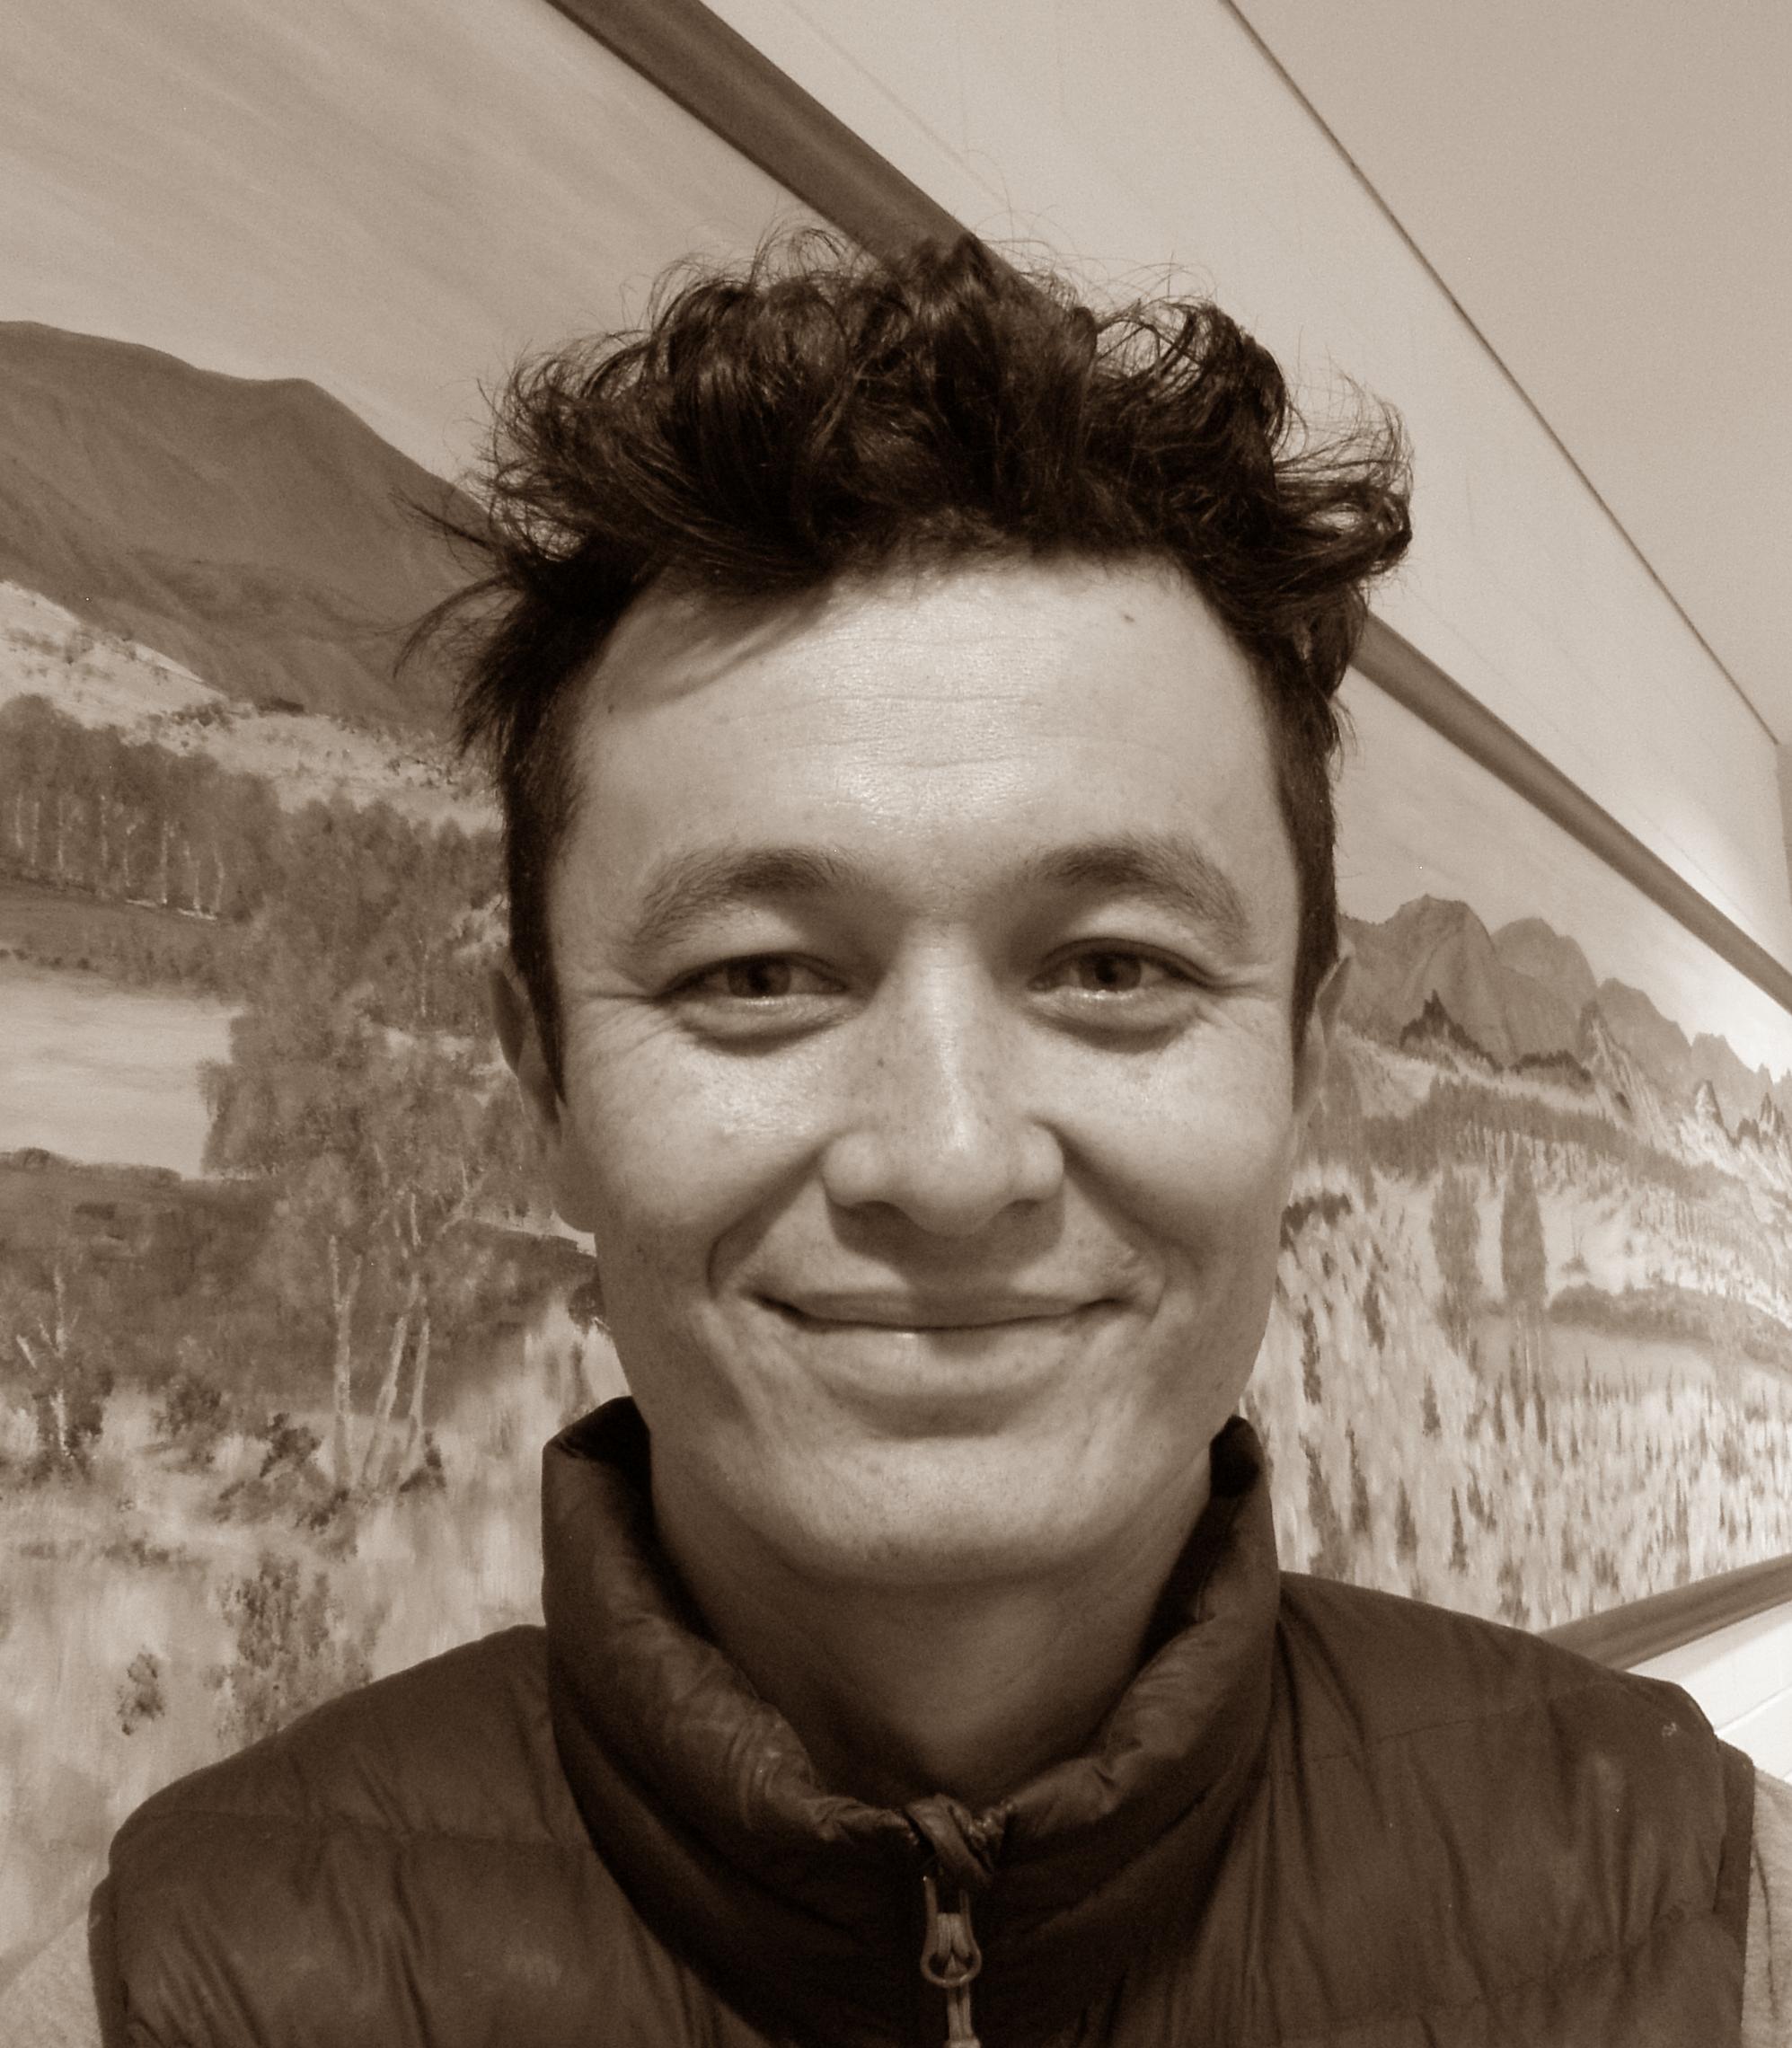 PJ (Peter) Young - Senior Engineer